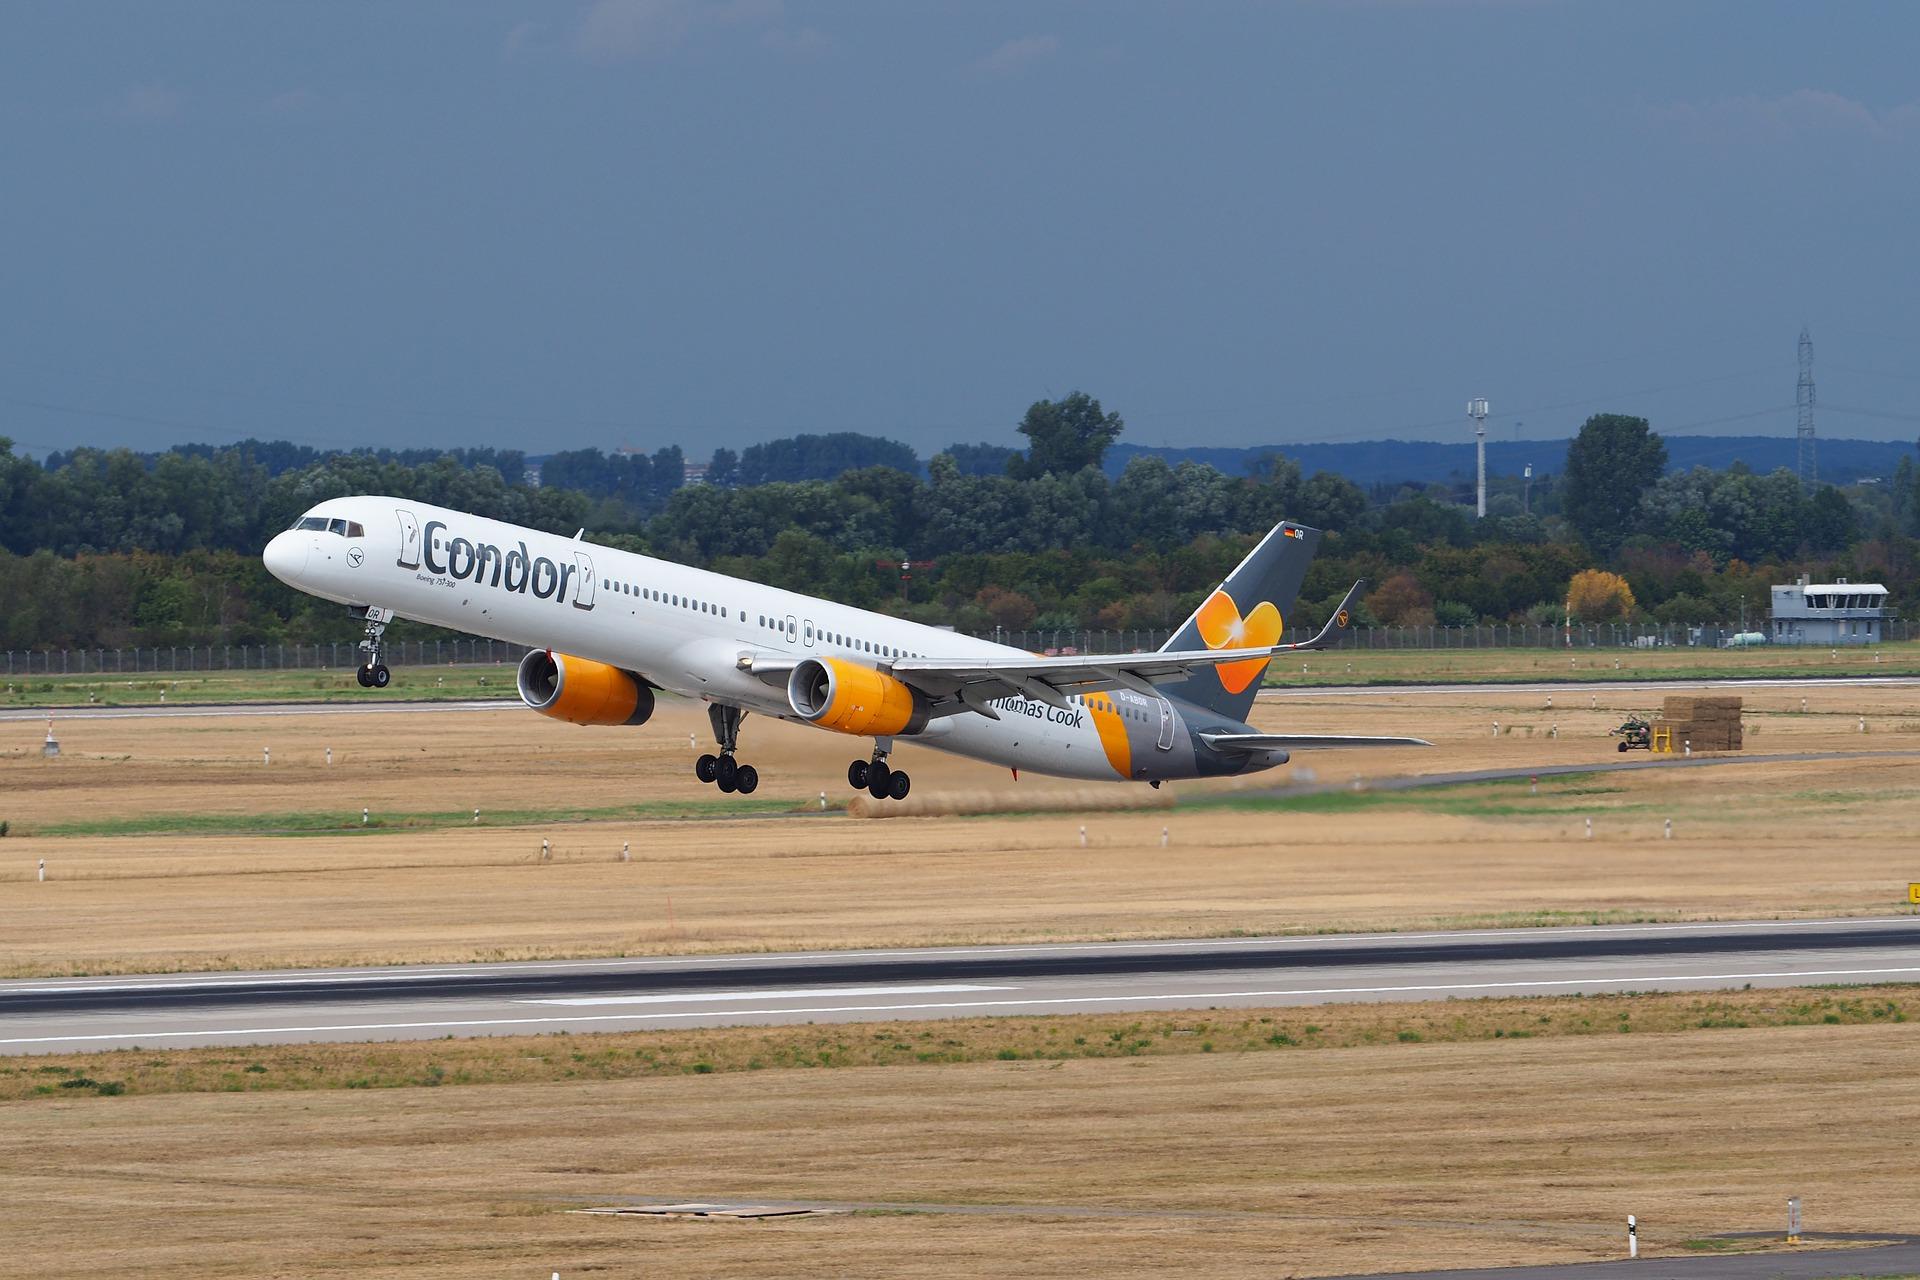 Літак Condor